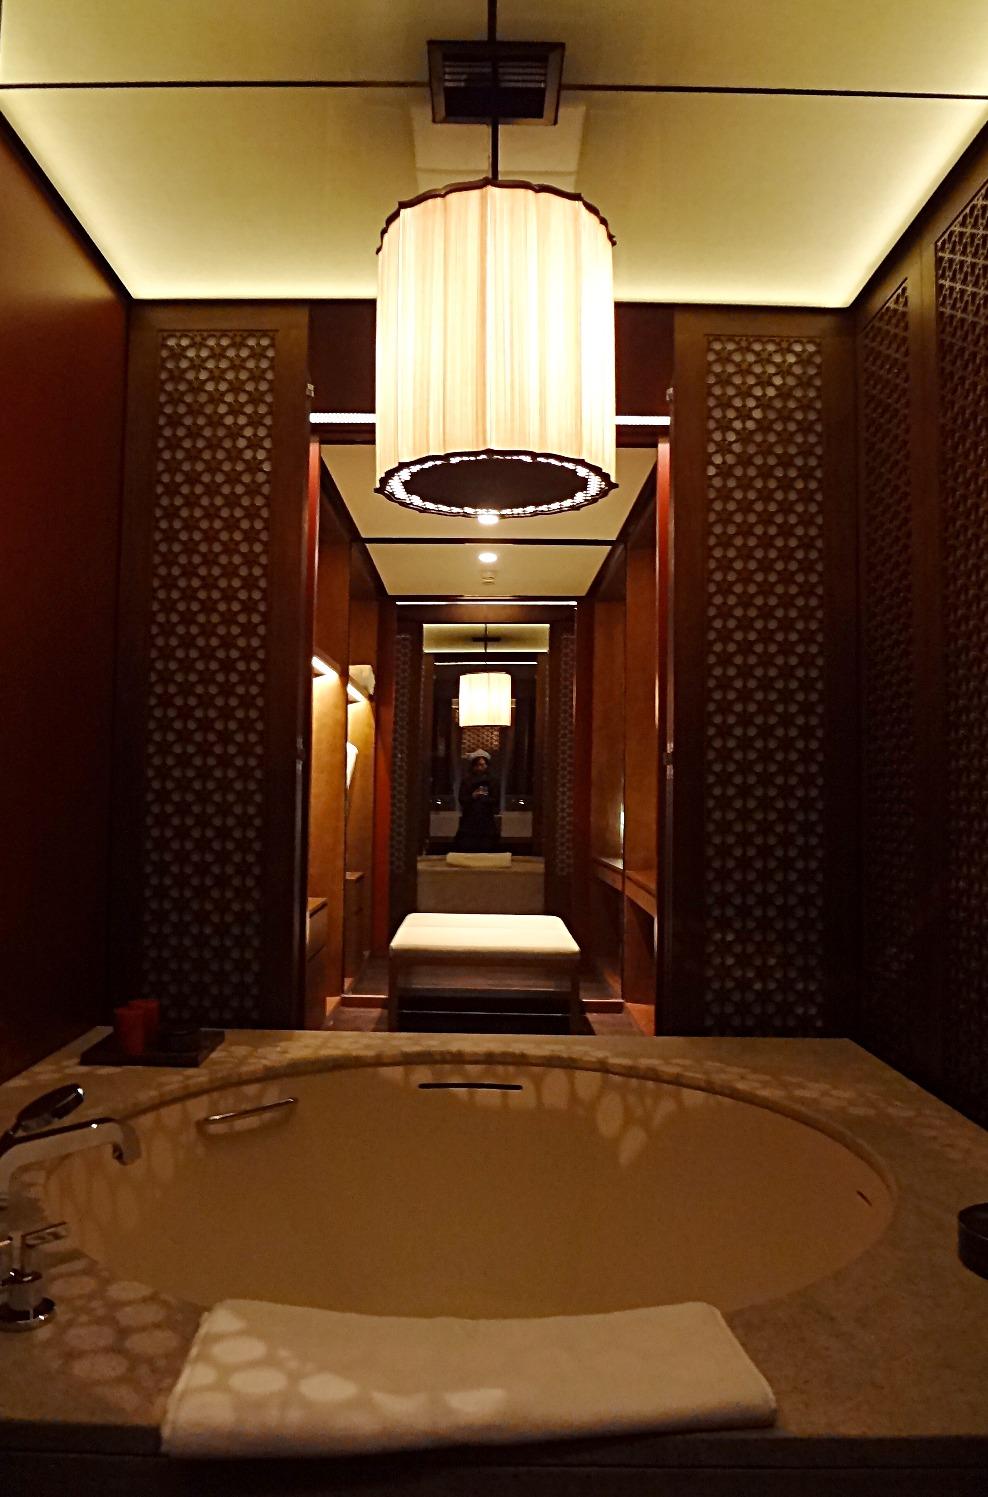 2013-01 Diaoyutai arts hotel Beijing mock up room photo4 by Ya-hui Cheng_edited